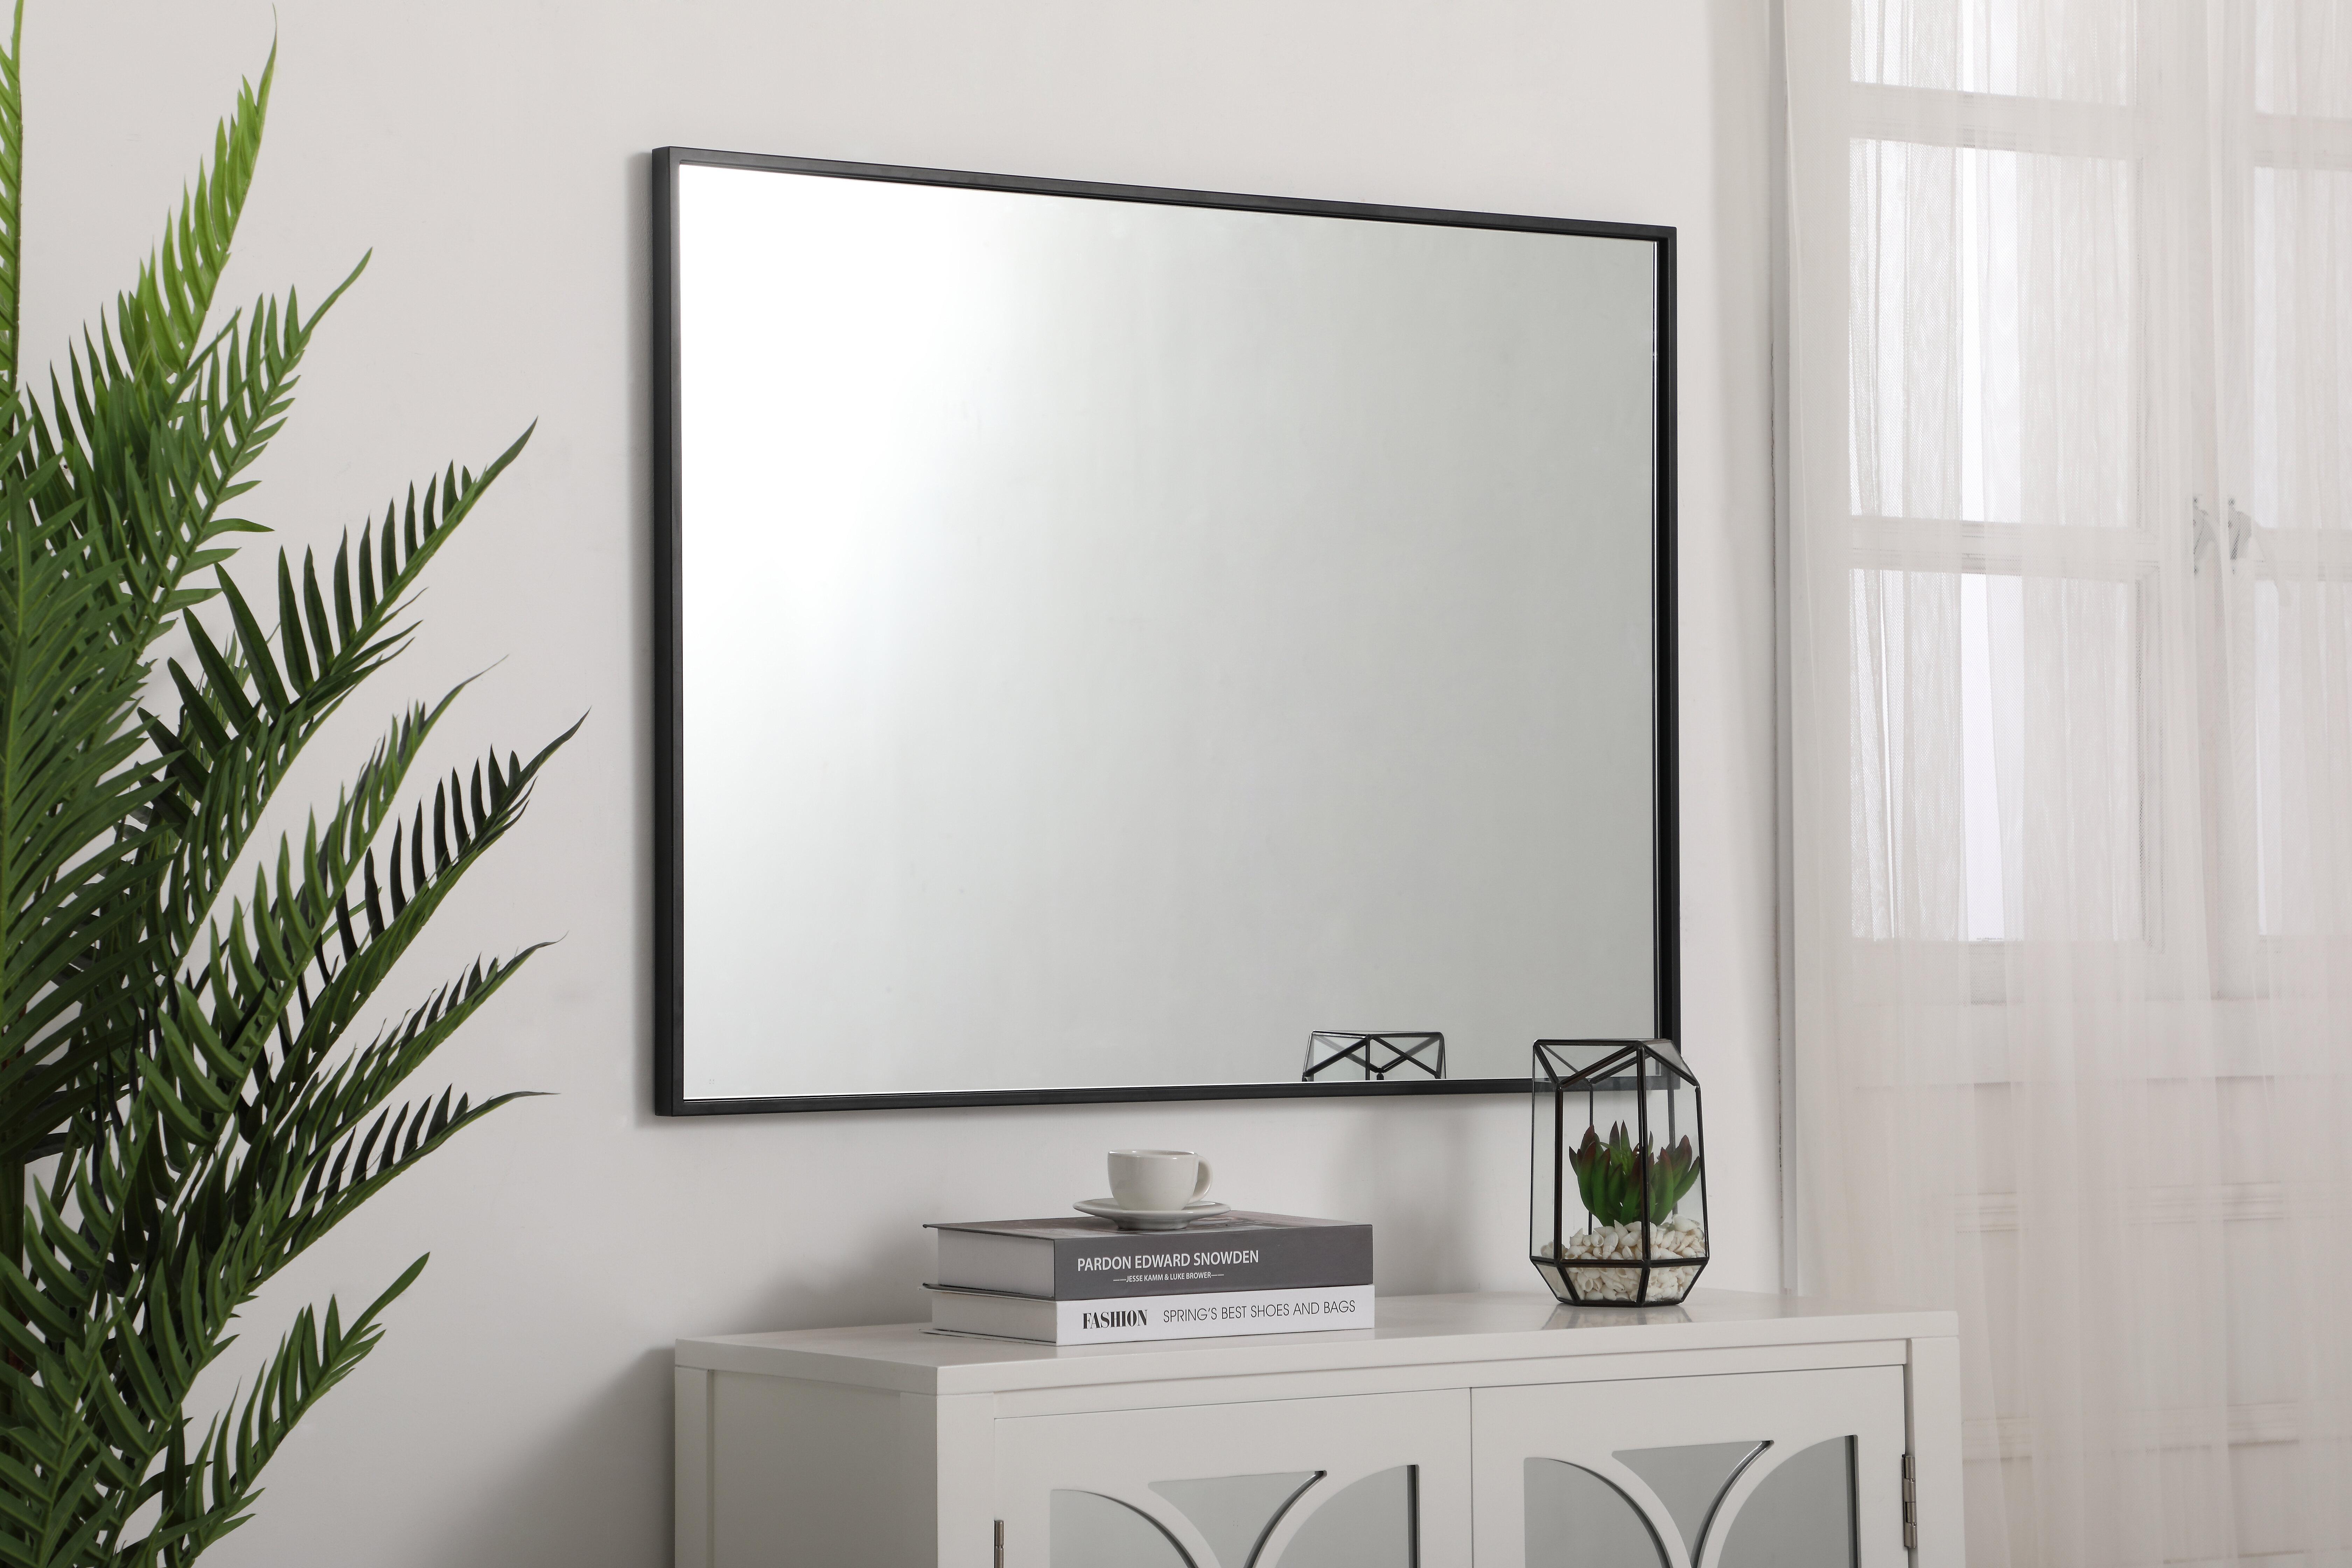 Three Posts Shildon Beveled Accent Mirror & Reviews | Wayfair With Regard To Shildon Beveled Accent Mirrors (View 5 of 20)